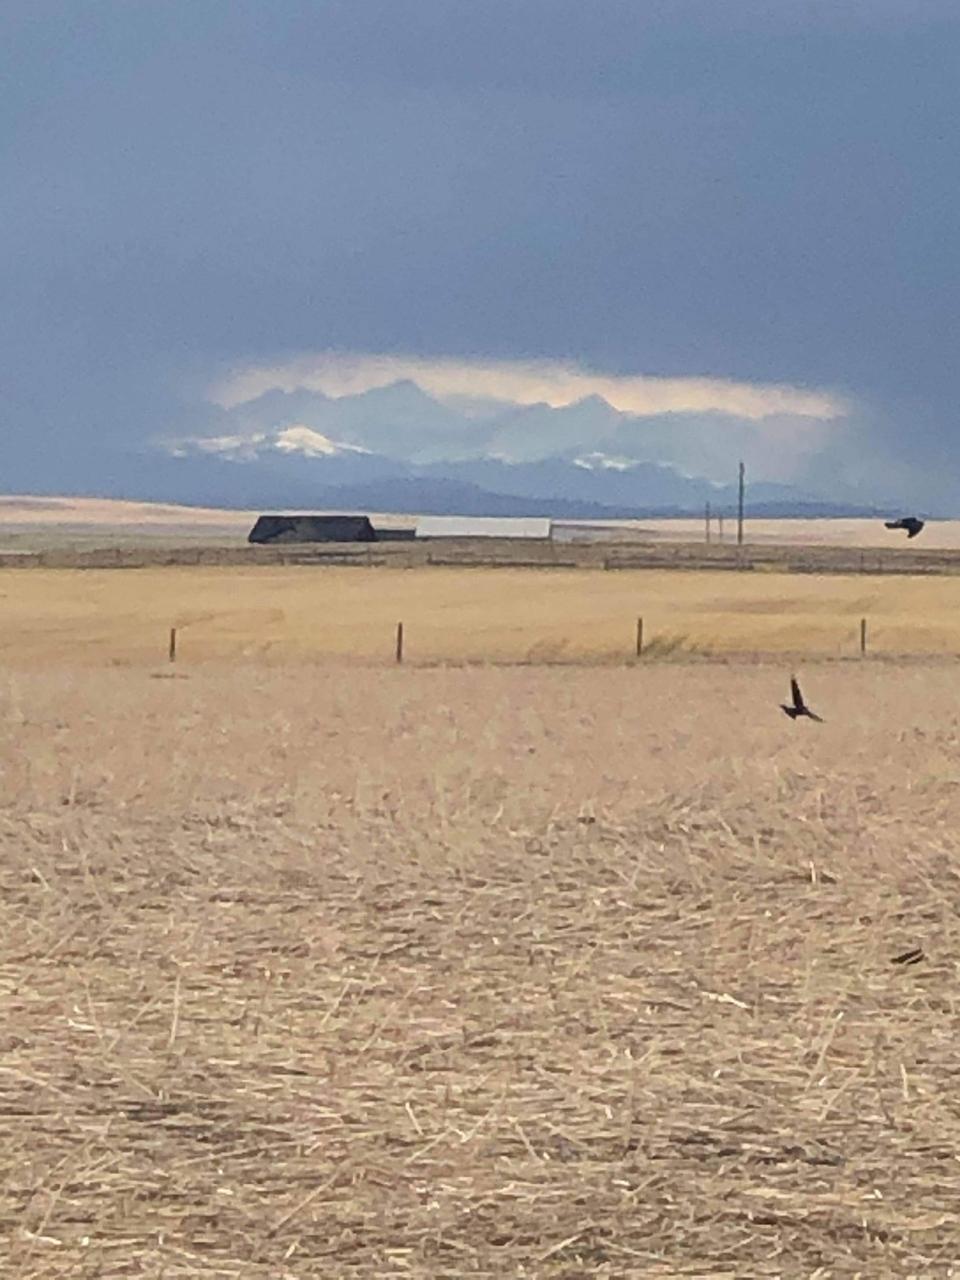 Southern Alberta, rainshowers, Ellen,